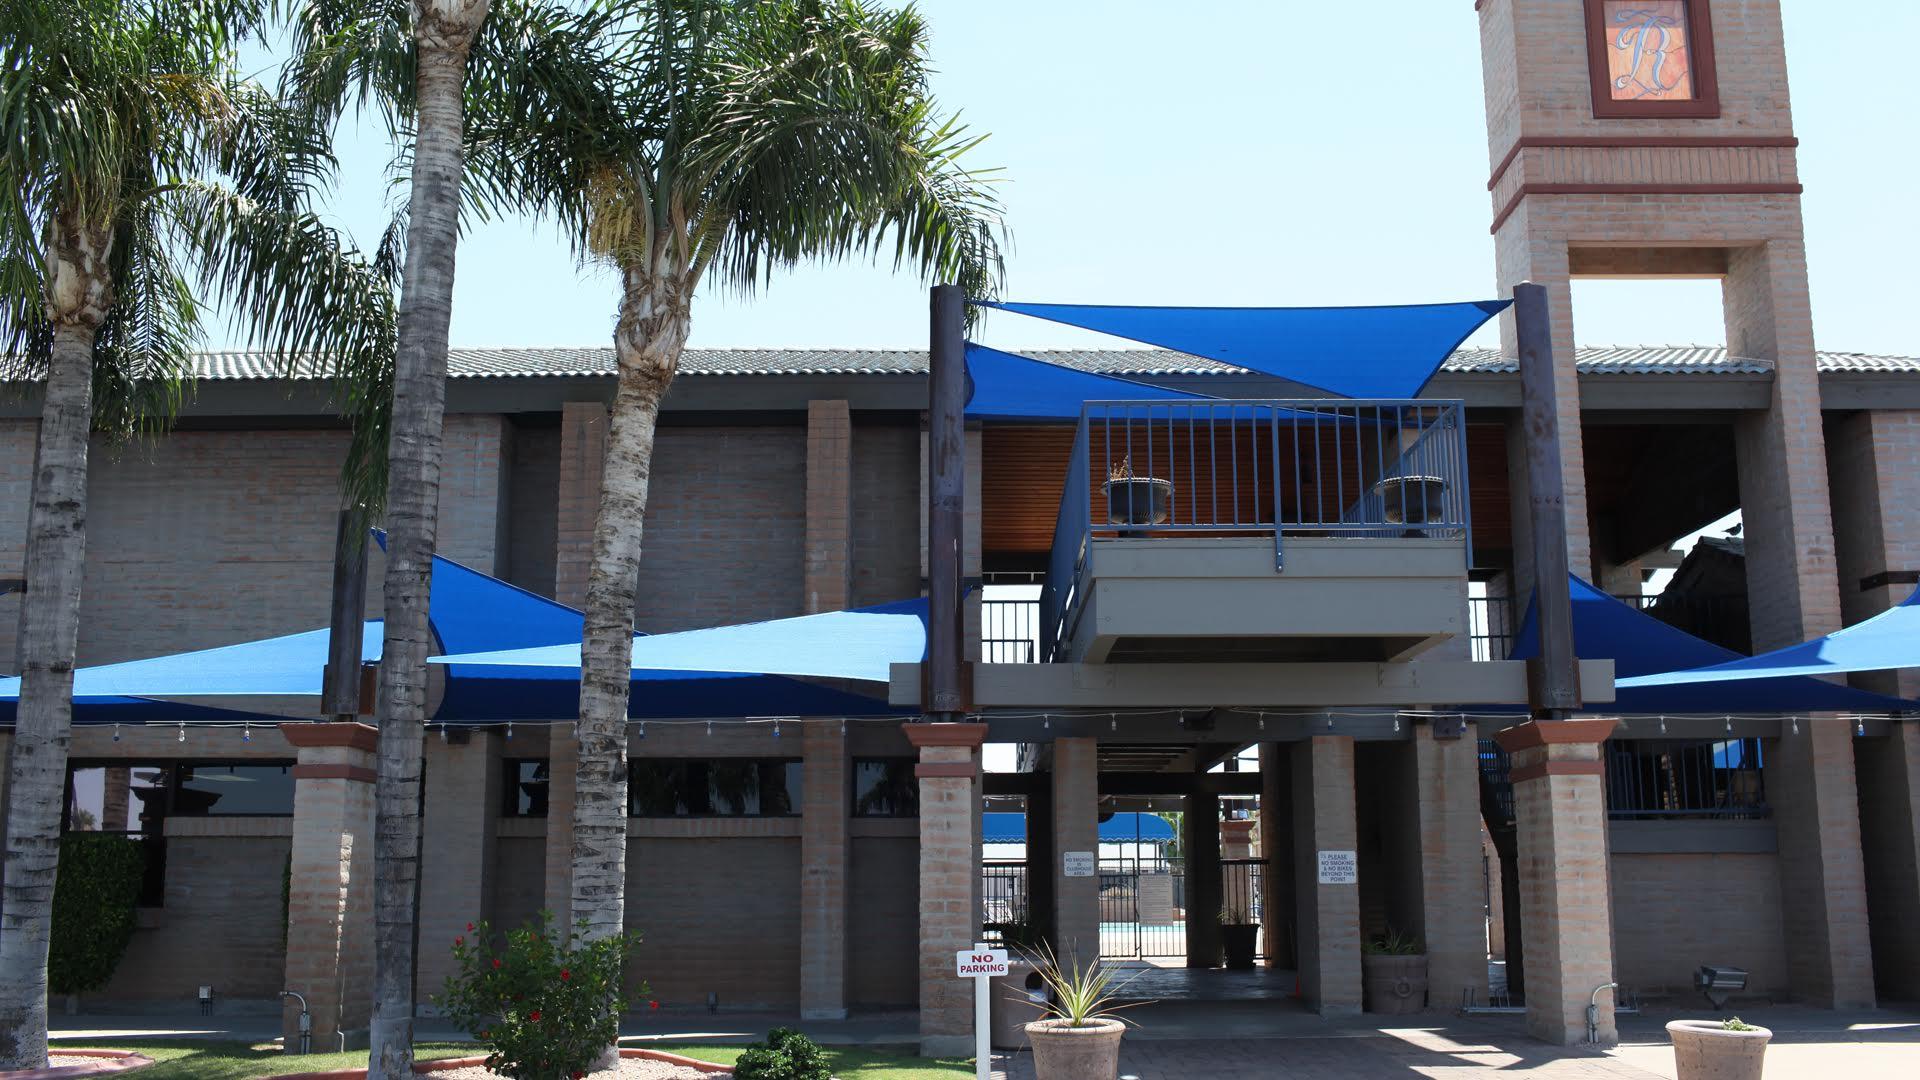 The Resort RV Park DISPLAY ACURAX ICONS